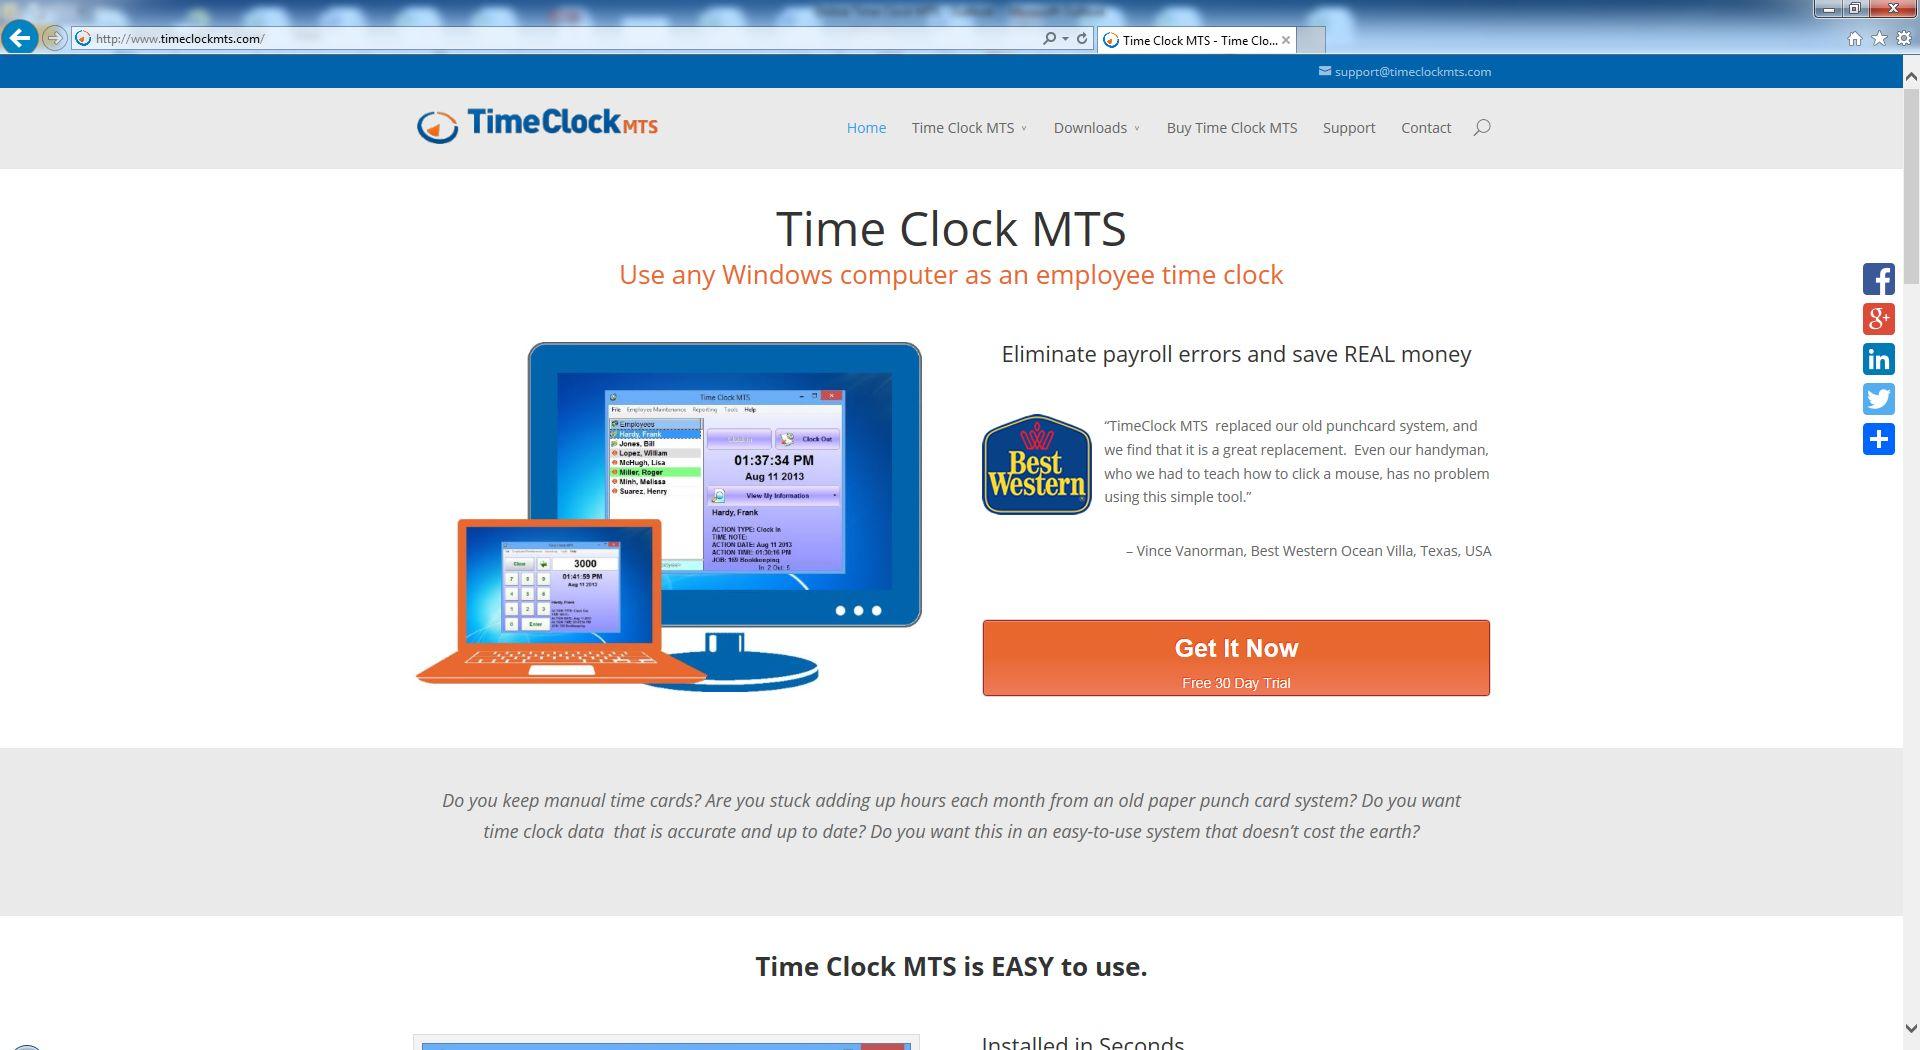 Timeclockmts